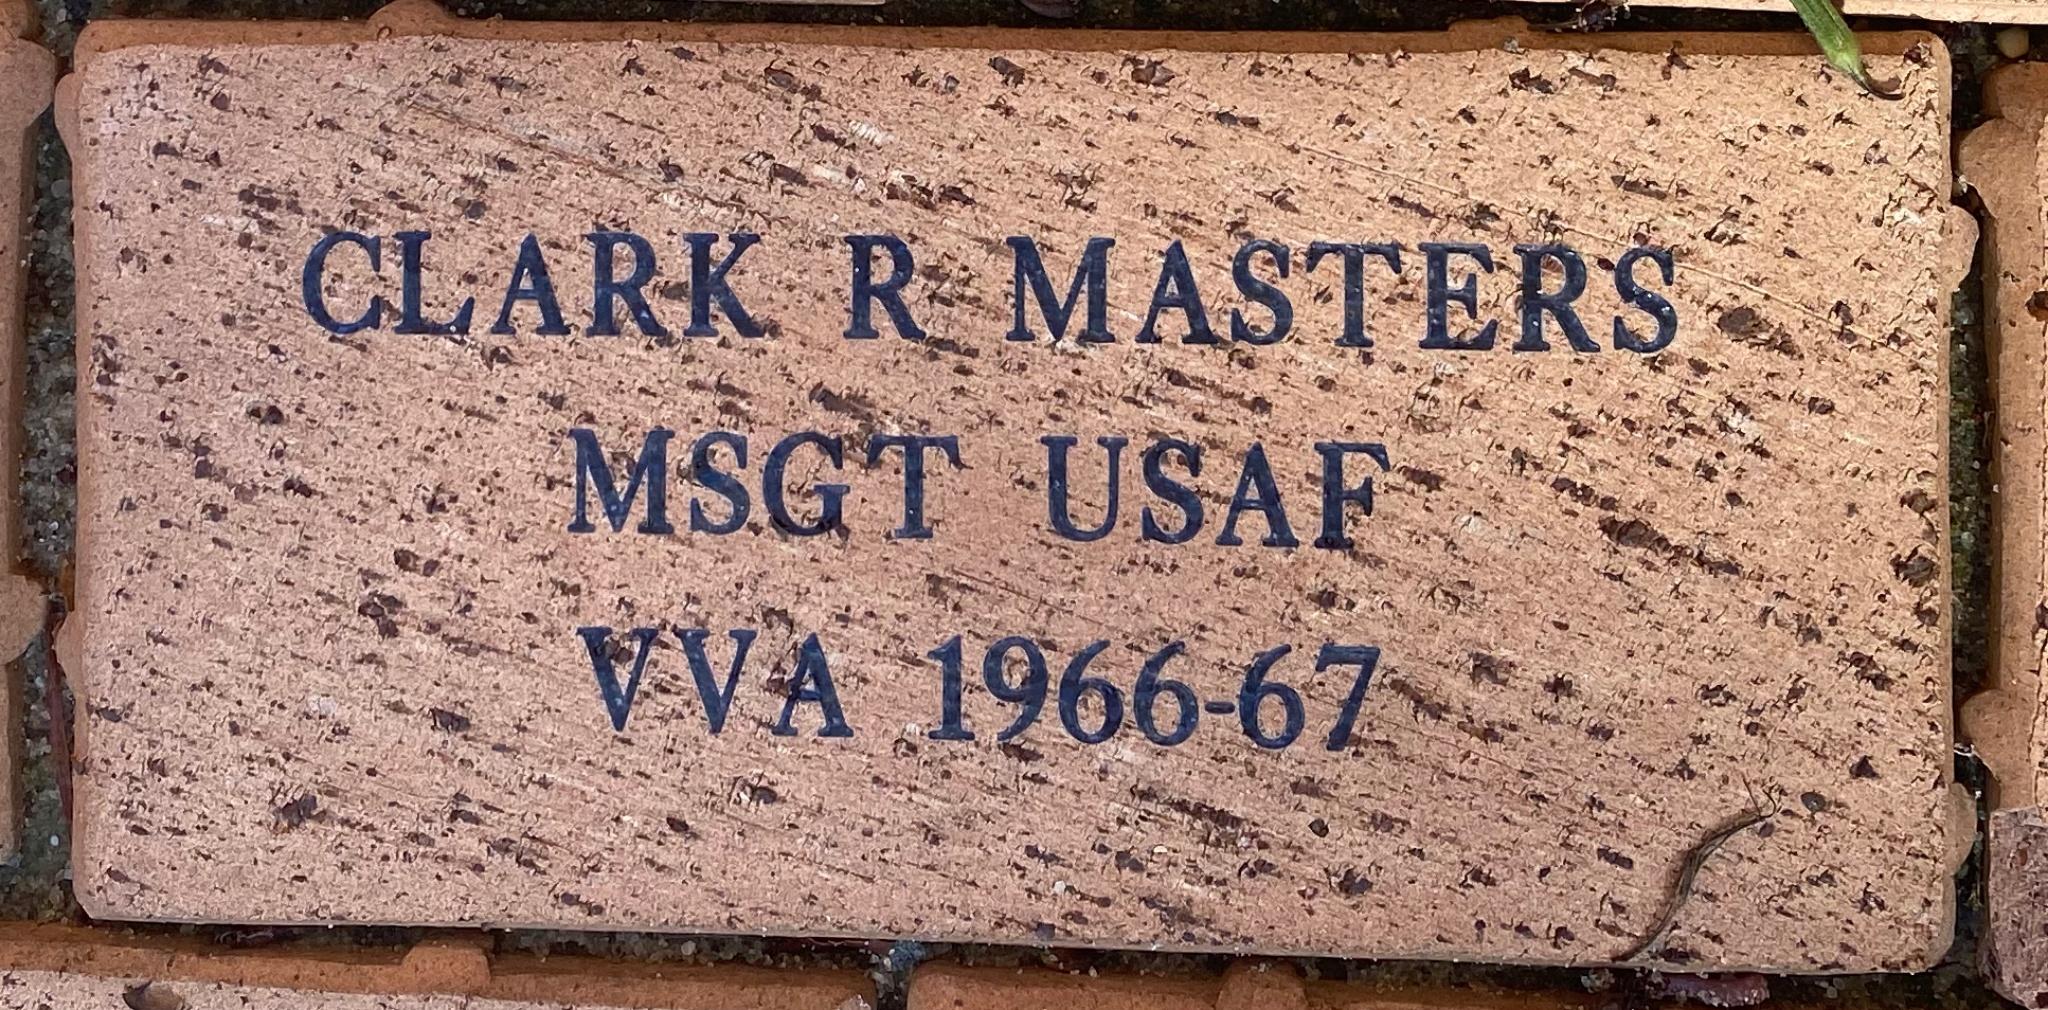 CLARK R MASTERS MSGT USAF VVA 1966-67